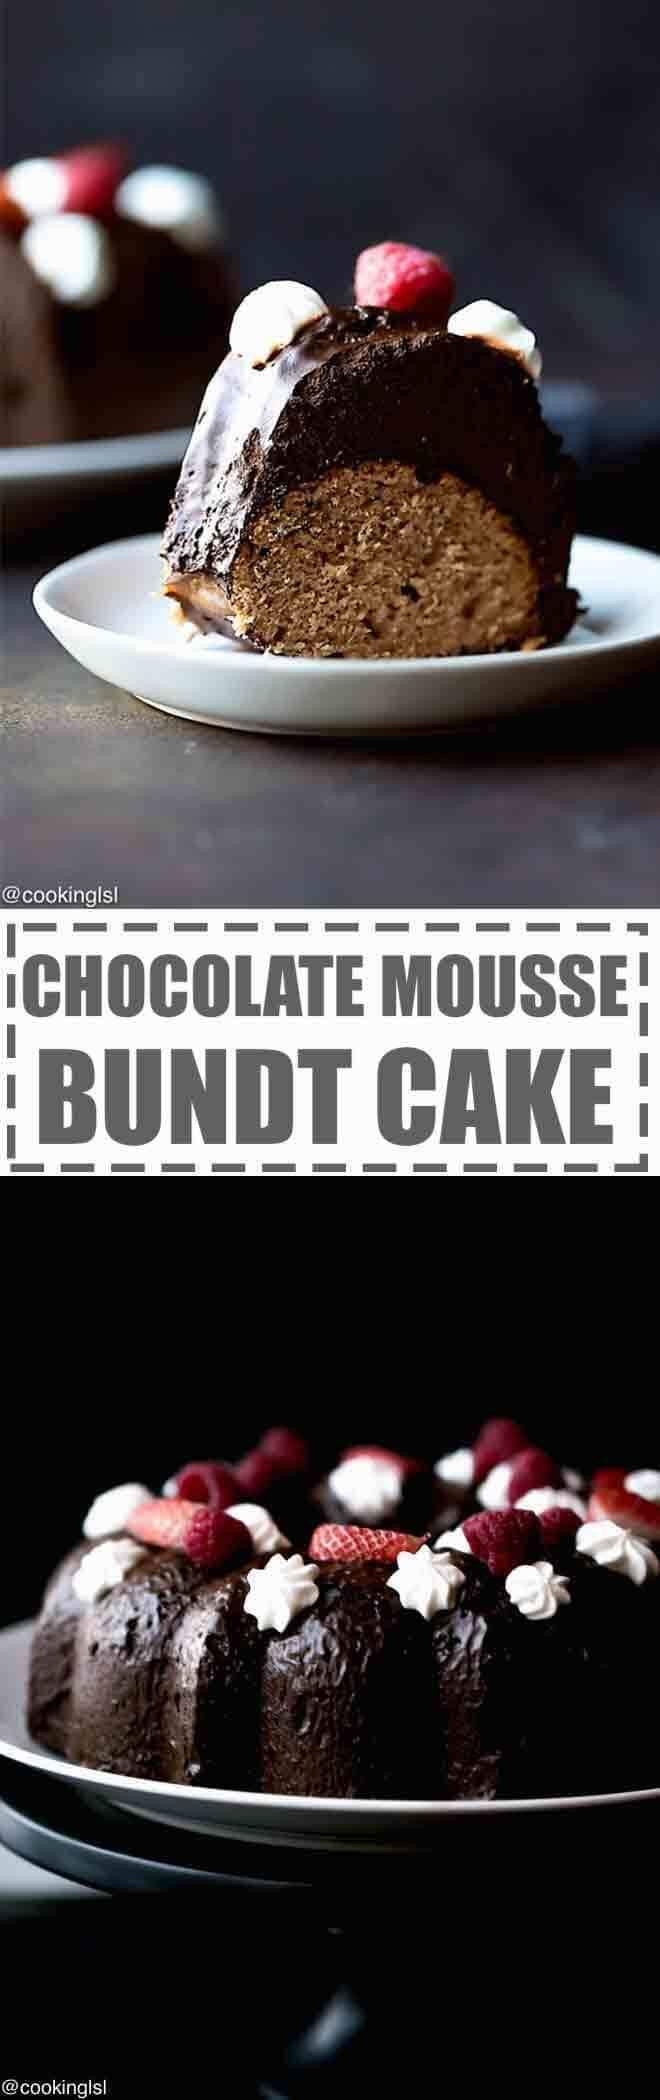 Bundt Cake Made With Saurekraut